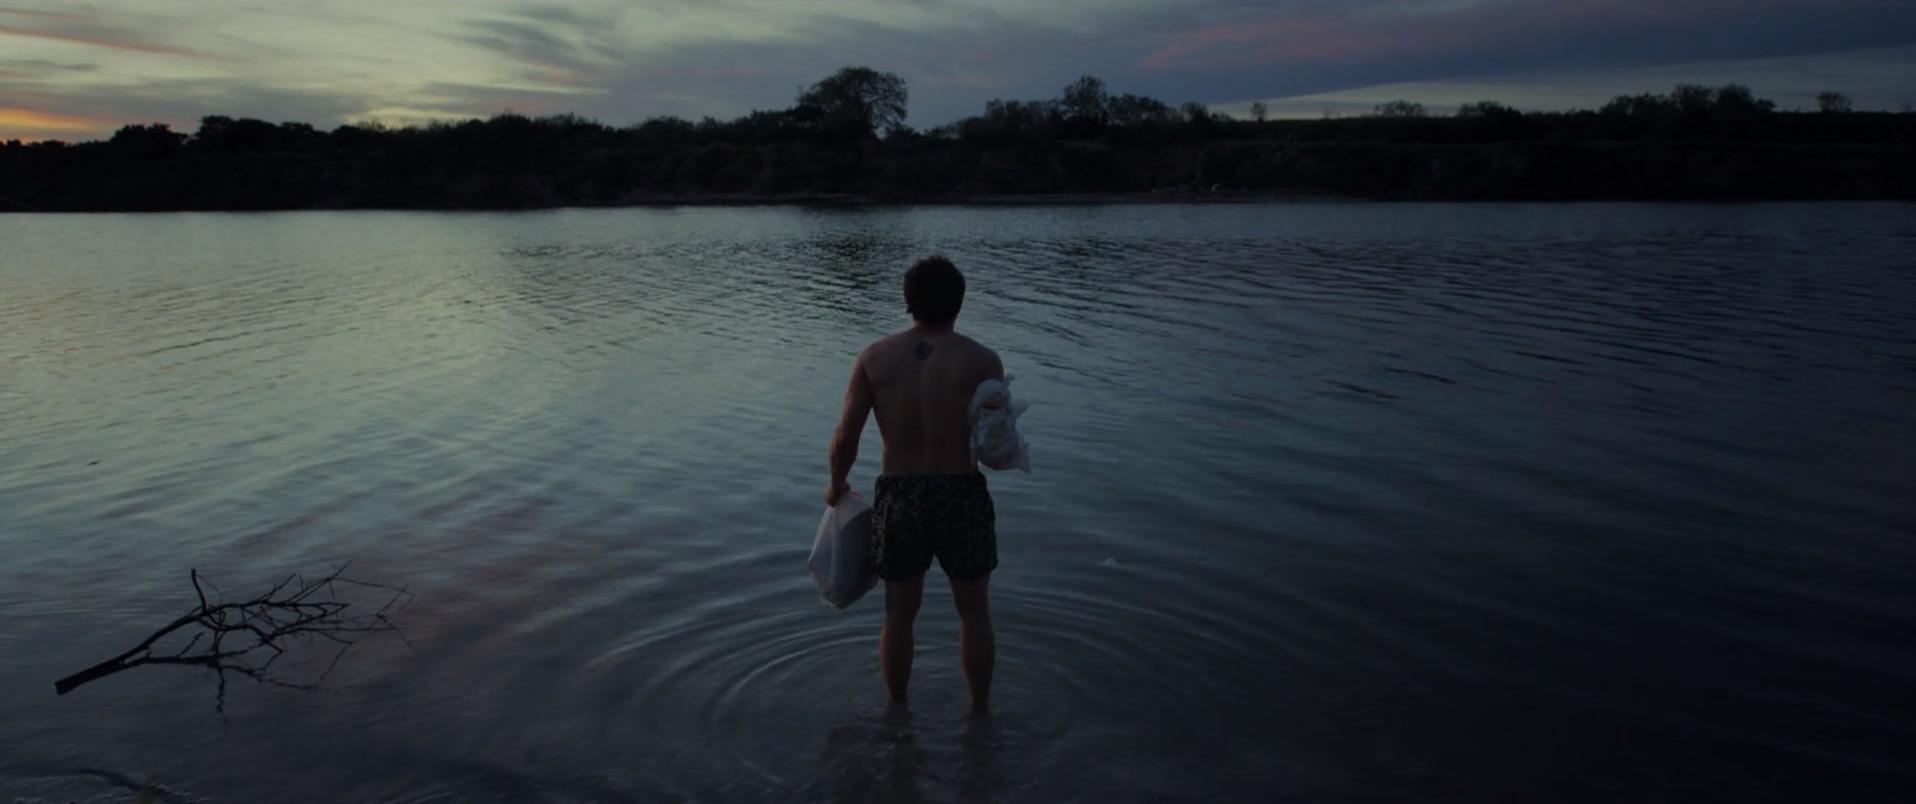 water outdoor lake man person beach sky clothing swimming nature river dark shore